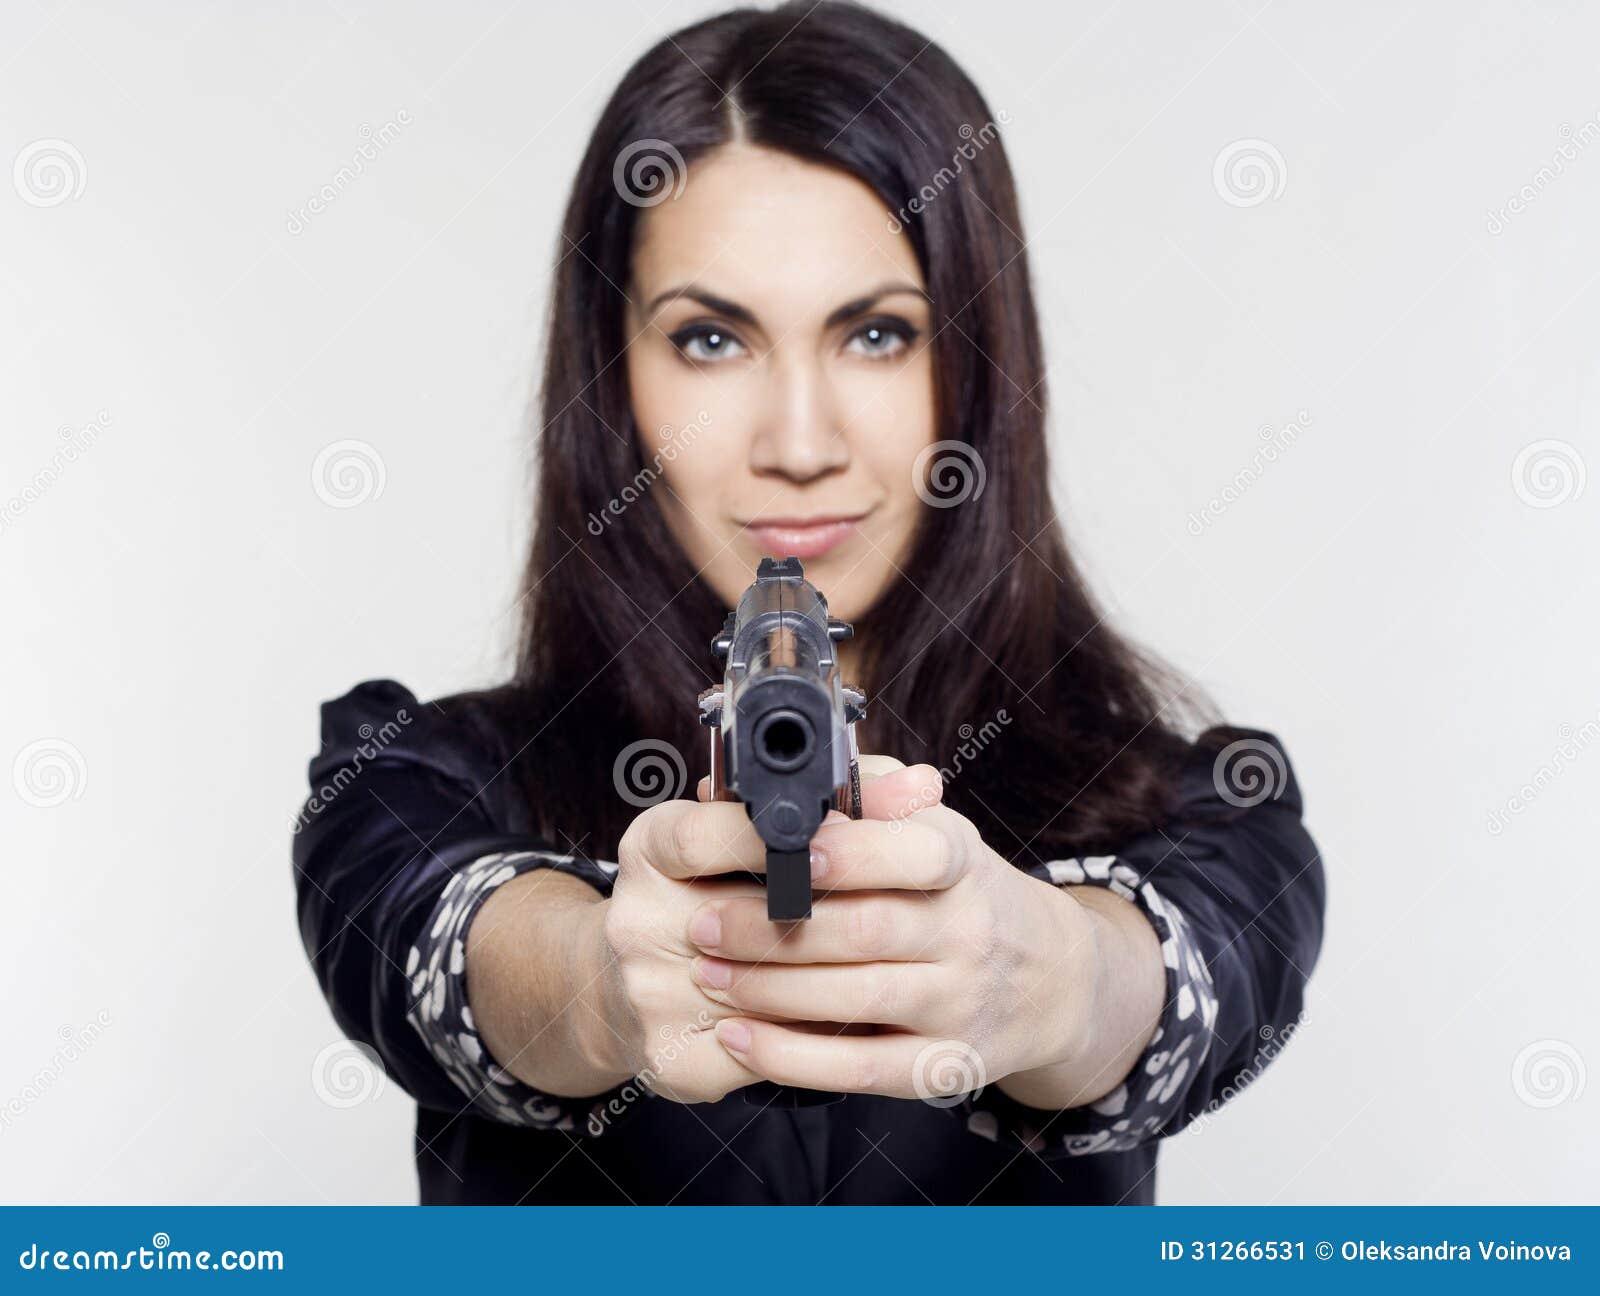 Girl screaming while getting banged